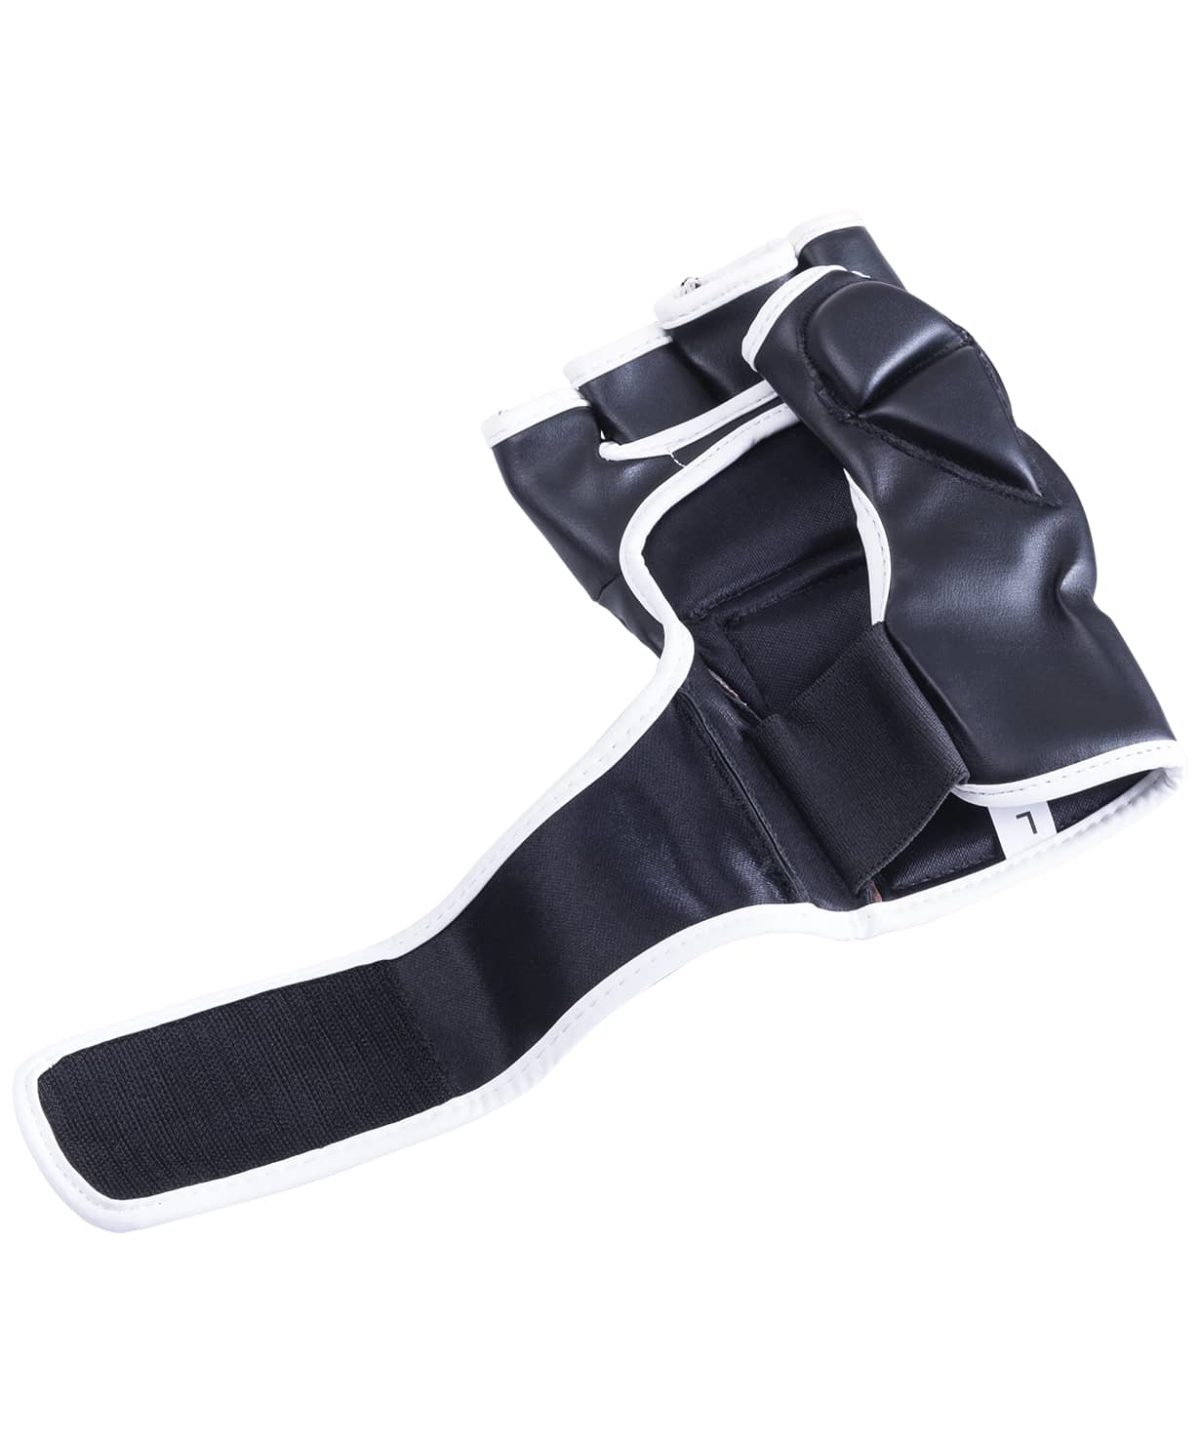 KSA Перчатки для ММА Wasp Black, к/з  7846 - 4